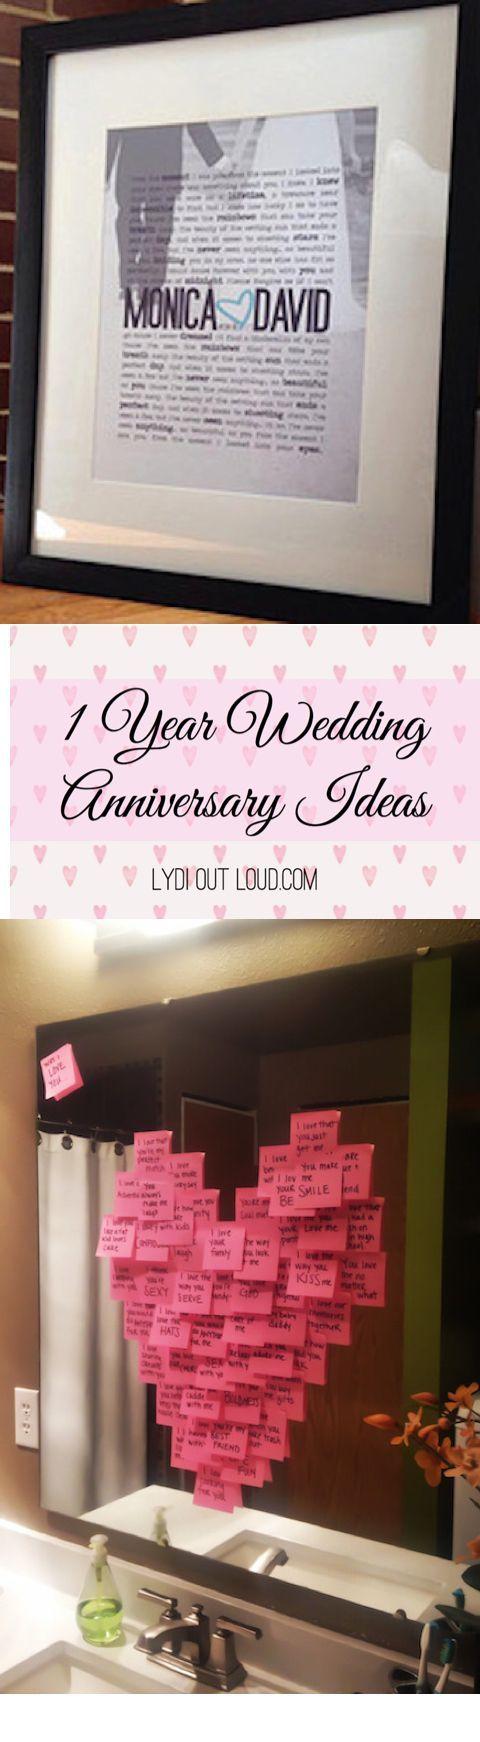 1 Year Anniversary Gift Ideas